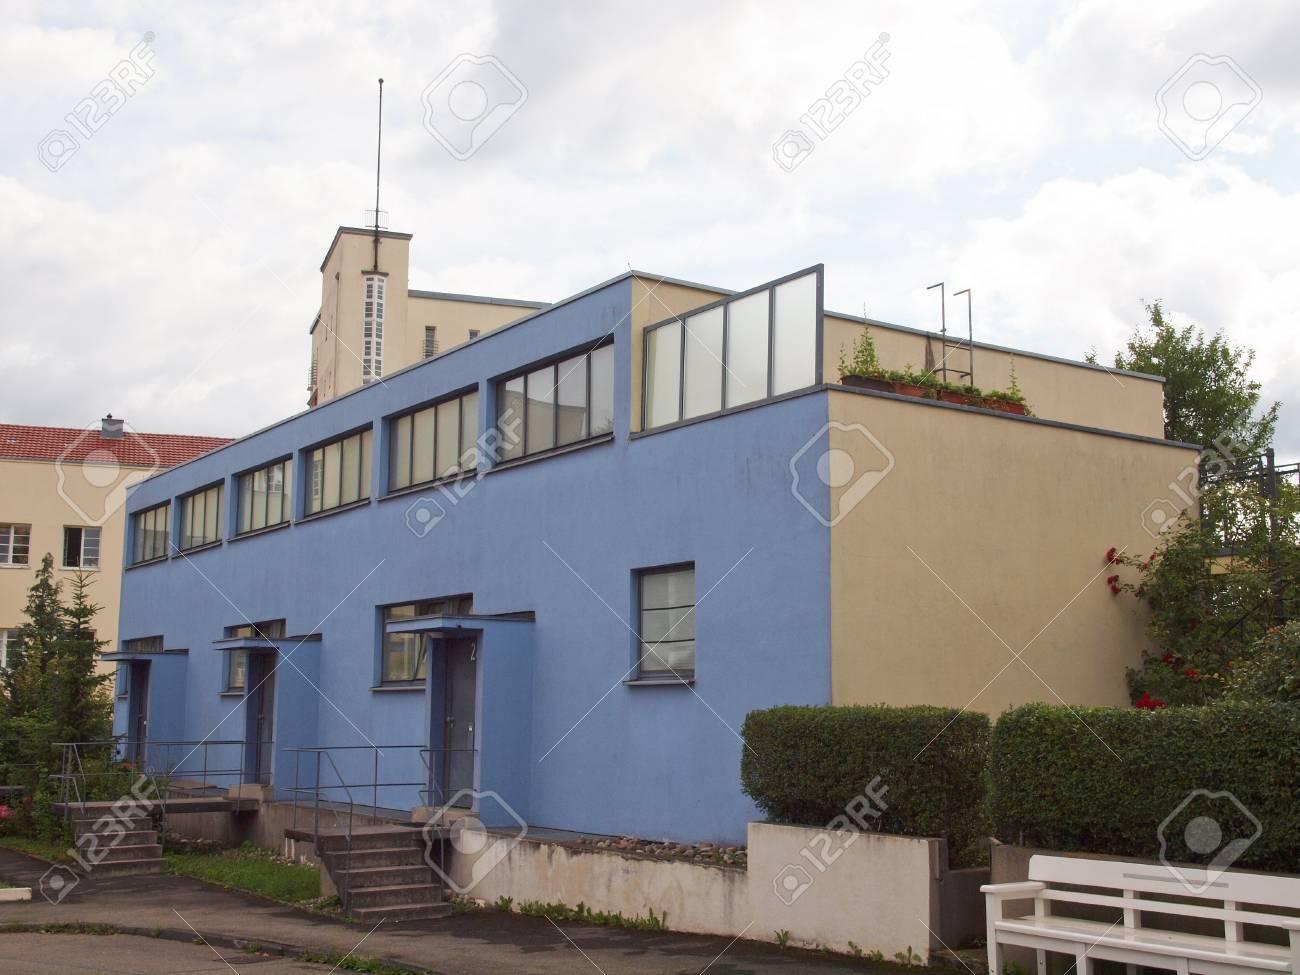 Weissenhof Siedlung model houses built in 1927 for the modern architecture exhibition in Stuttgart Stock Photo - 15792657